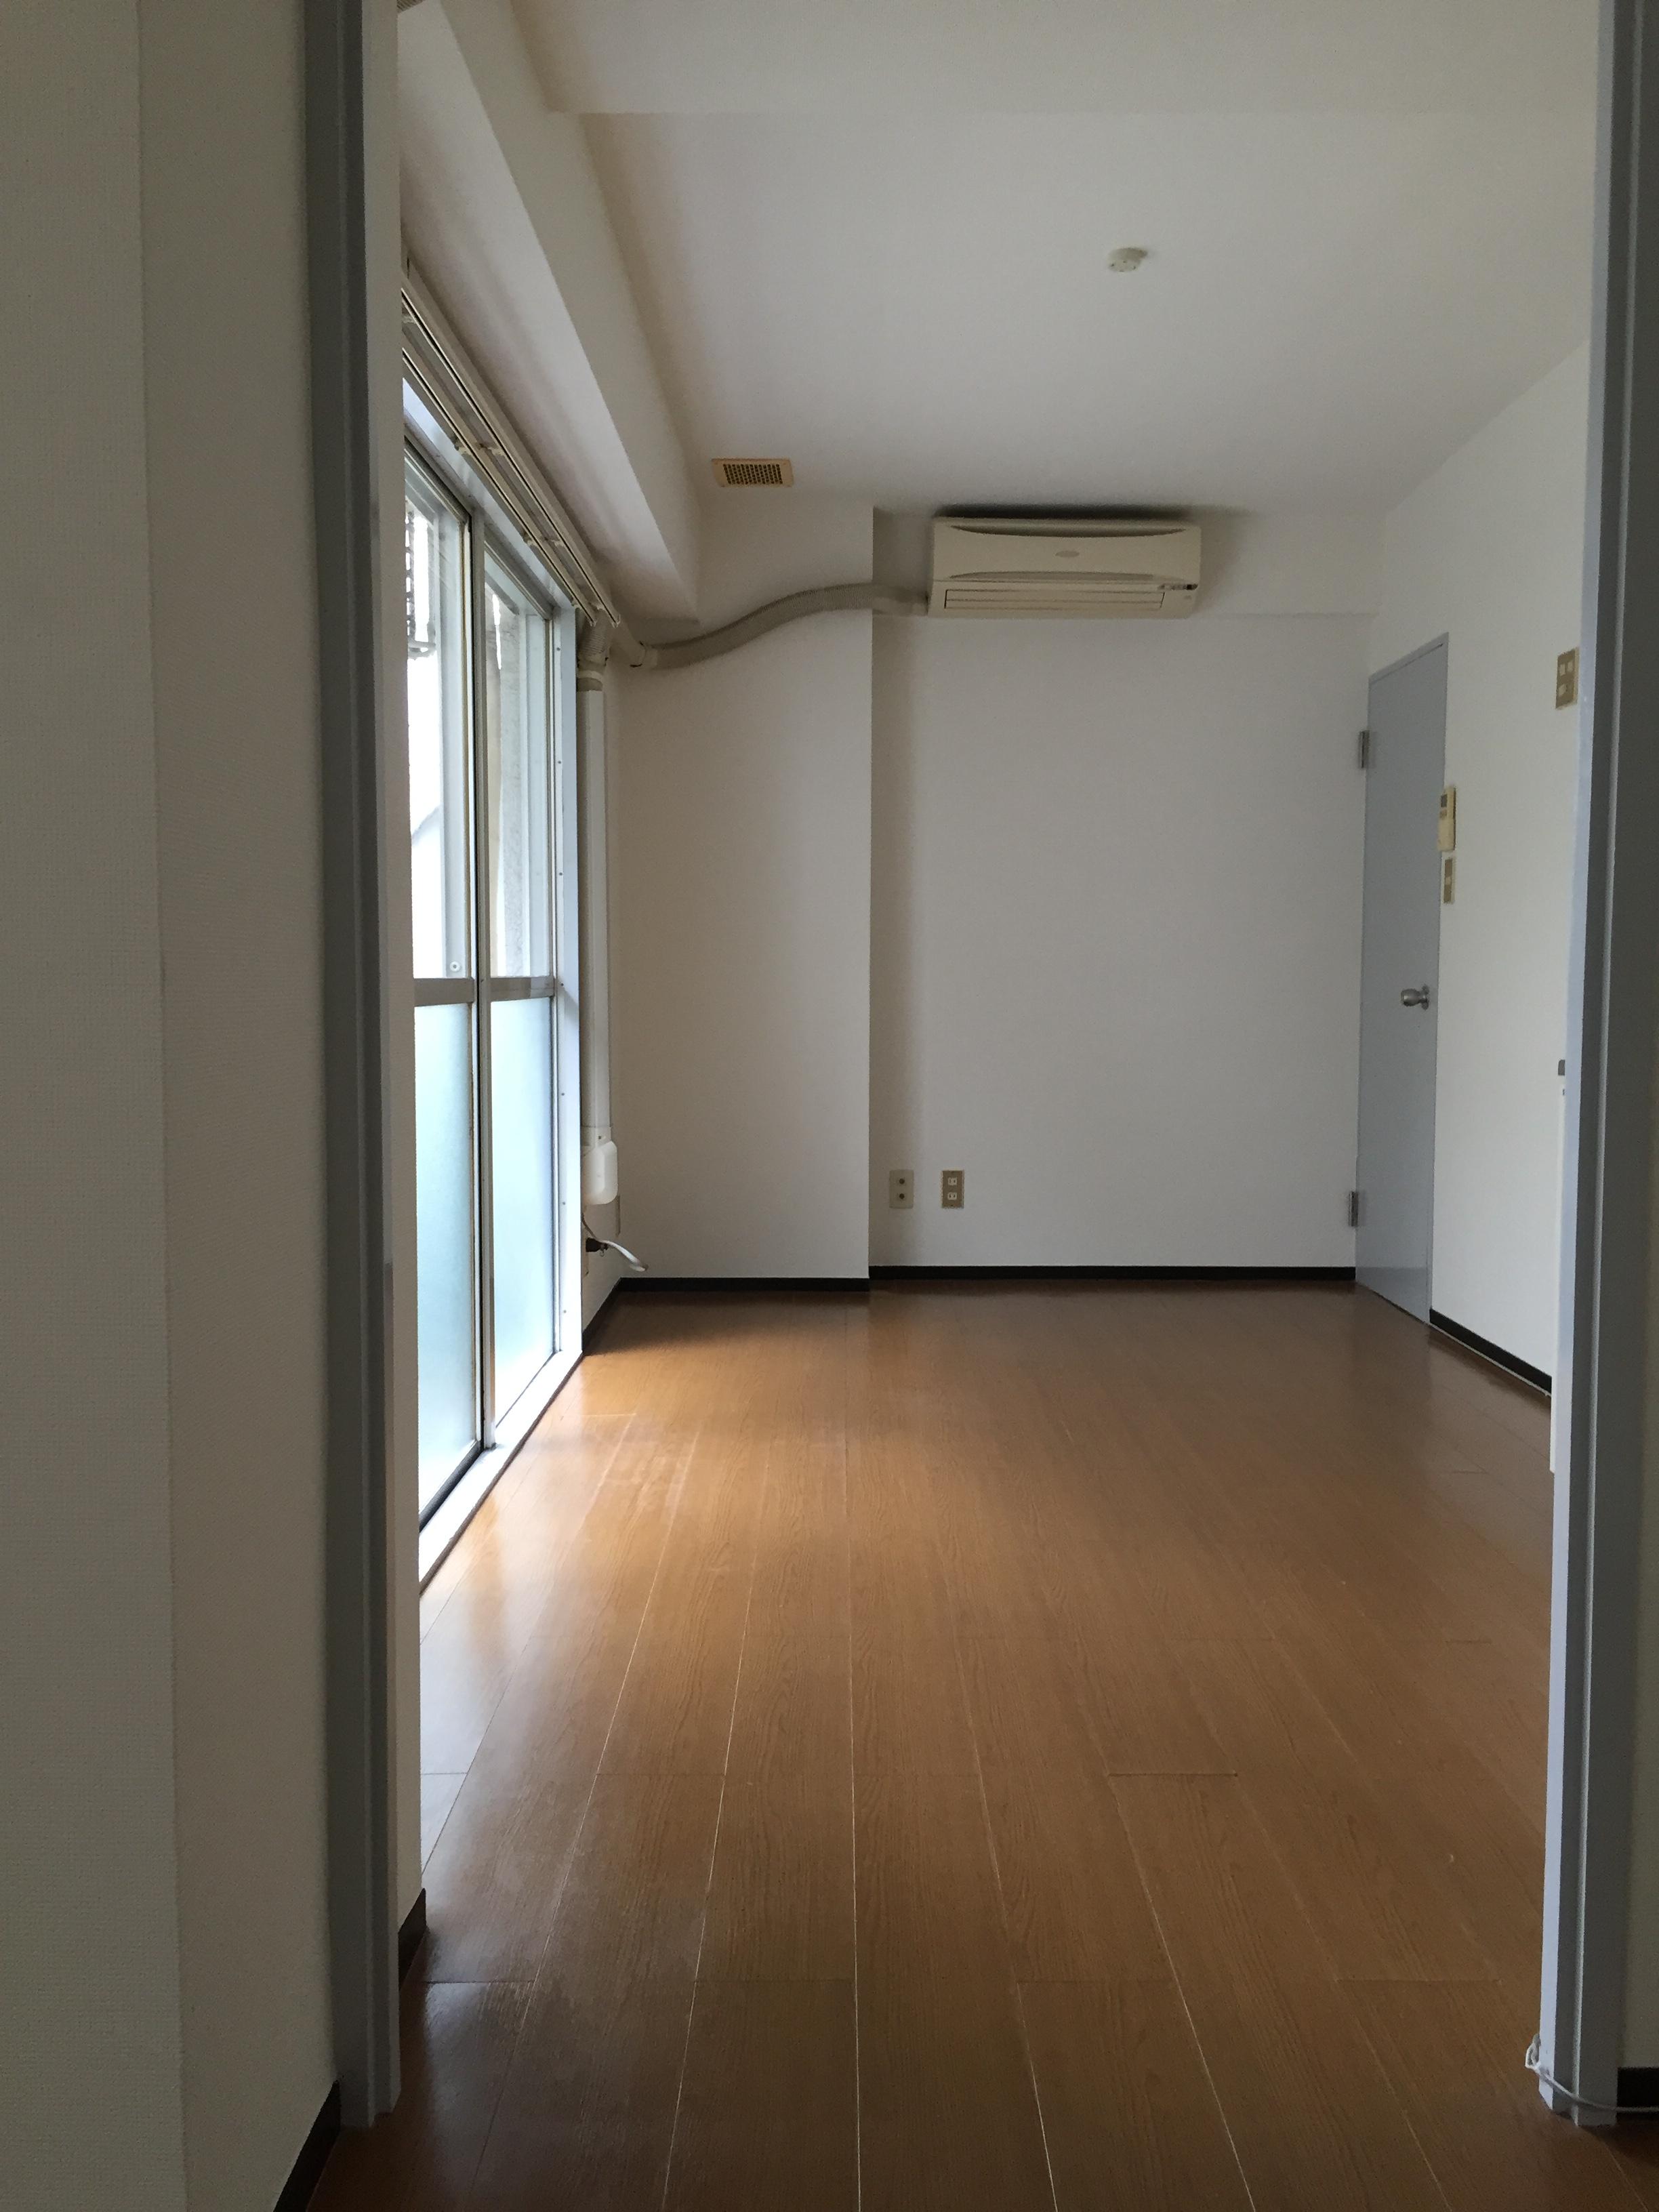 JR山手線「原宿駅」徒歩10分 分譲賃貸マンション 1DK 32.18㎡ 事務所相談可 画像6